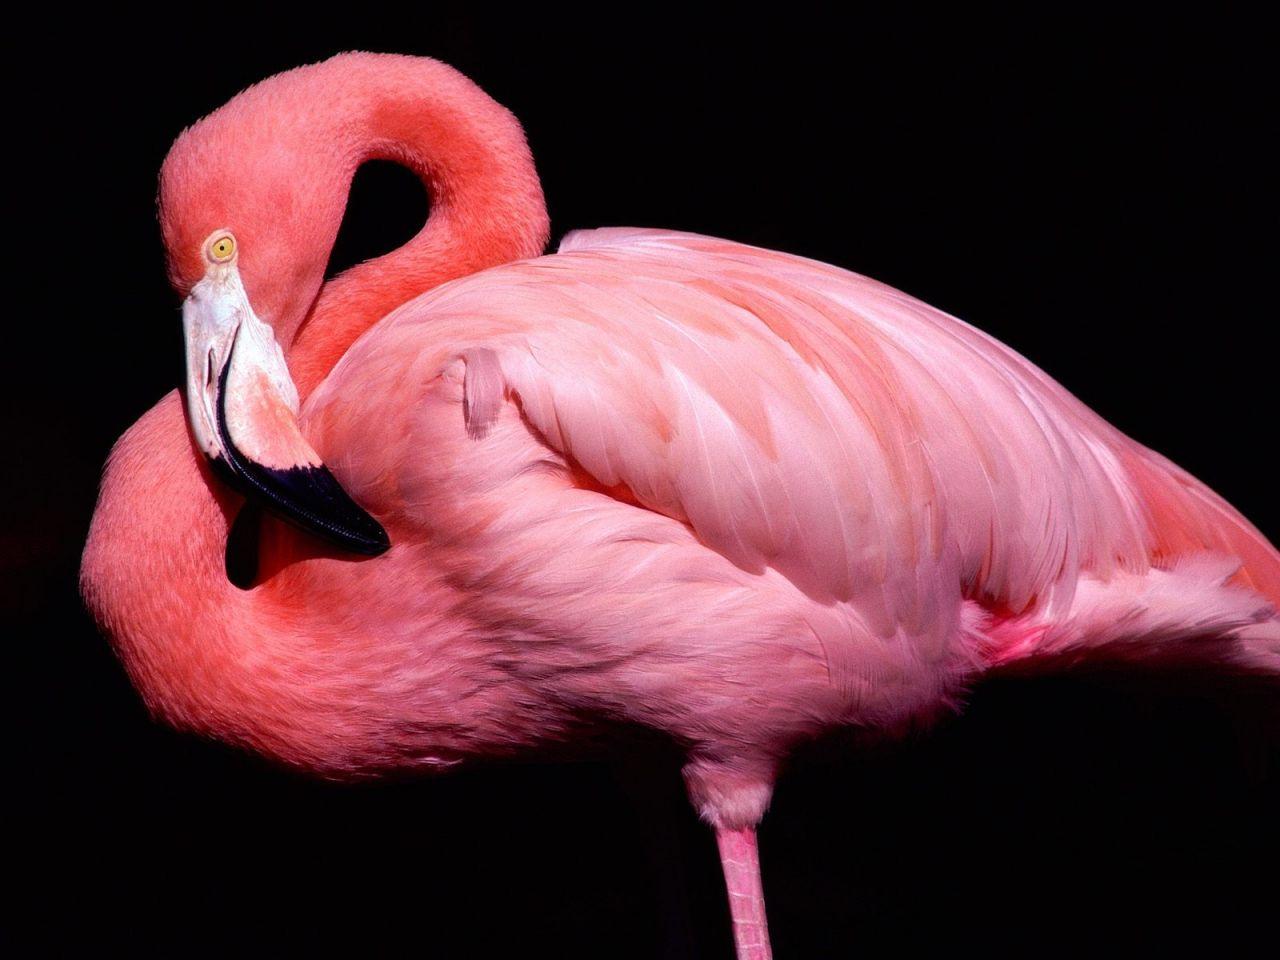 Pink Flamingo Close Up Portrait Wallpaper 1280x960